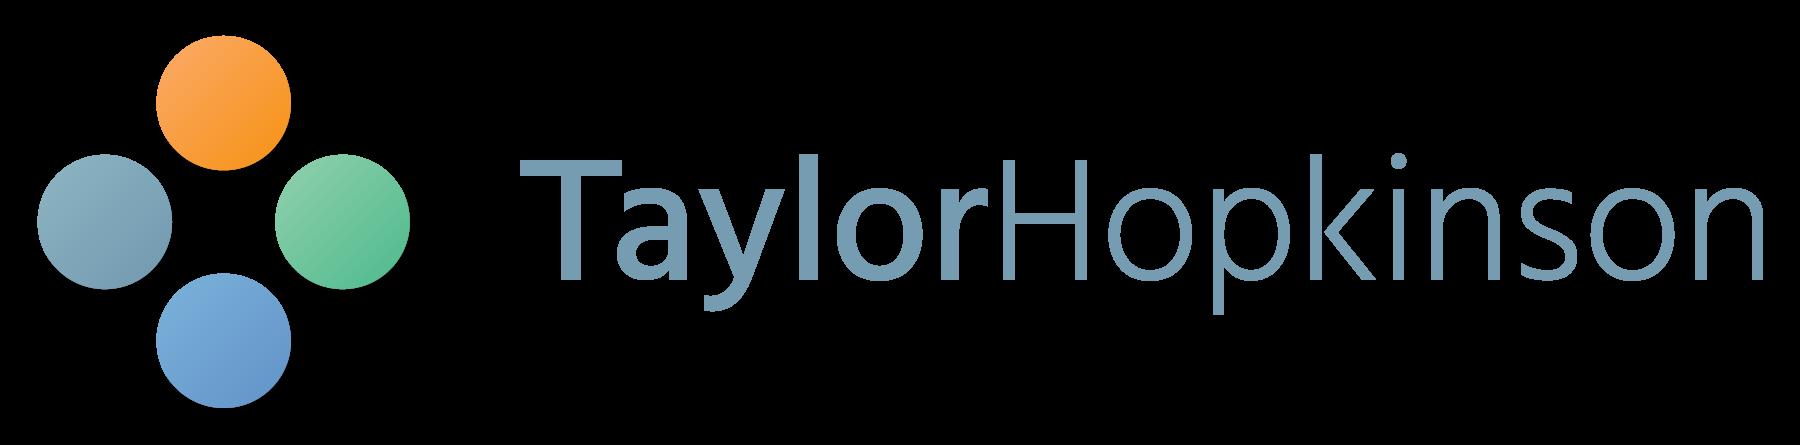 Taylor Hopkinson